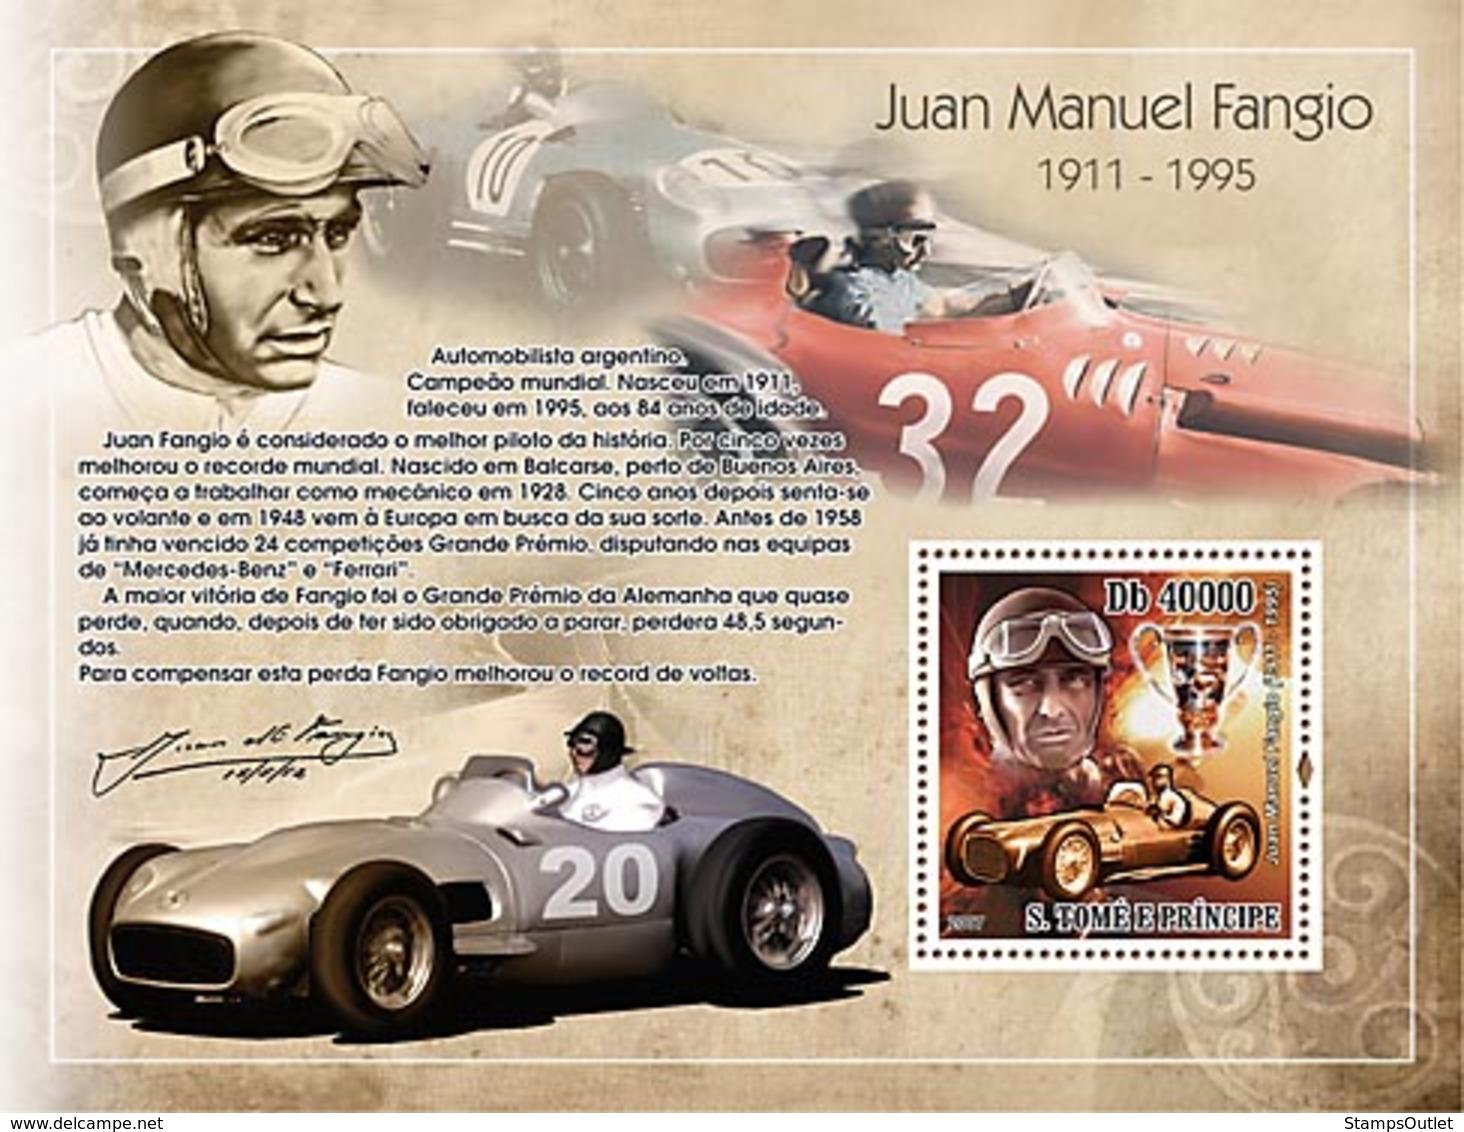 S. TOME & PRINCIPE 2007 - Car Racing - Juan Manuel Fangio S/s - YT 388, Mi 3174/BL617 - Sao Tome And Principe